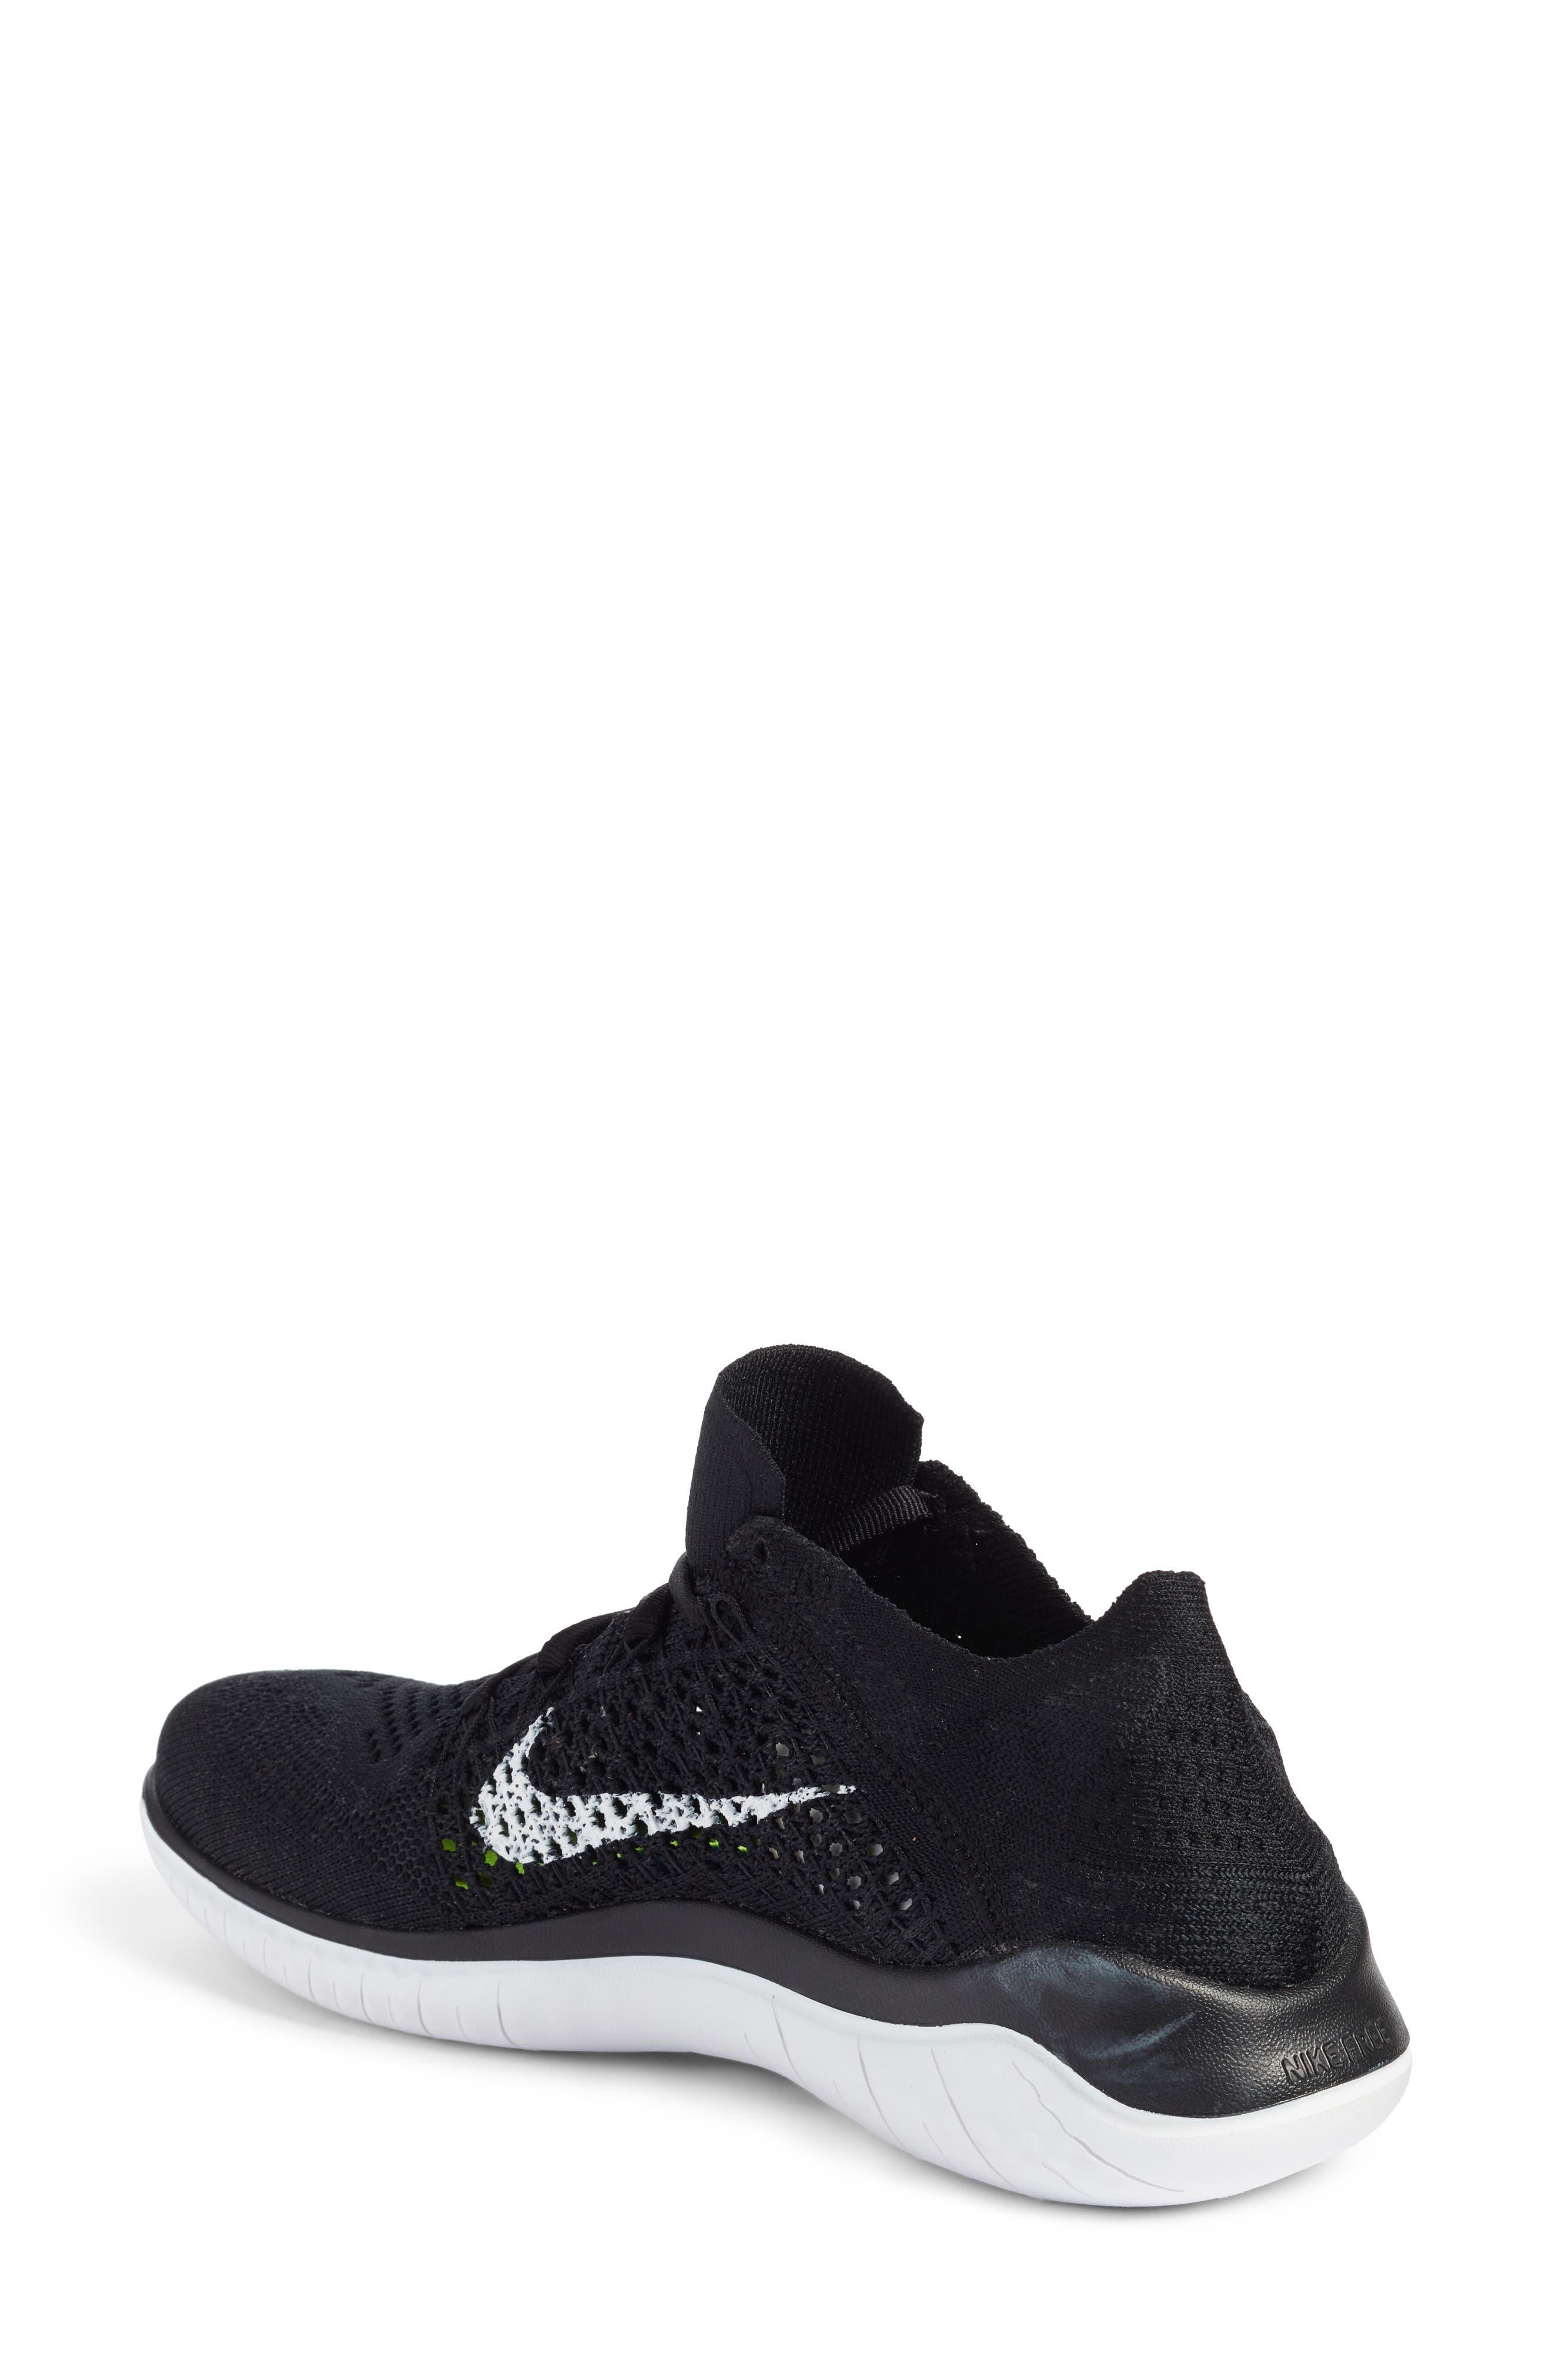 Alternate Image 2  - Nike Free RN Flyknit 2018 Running Shoe (Women)